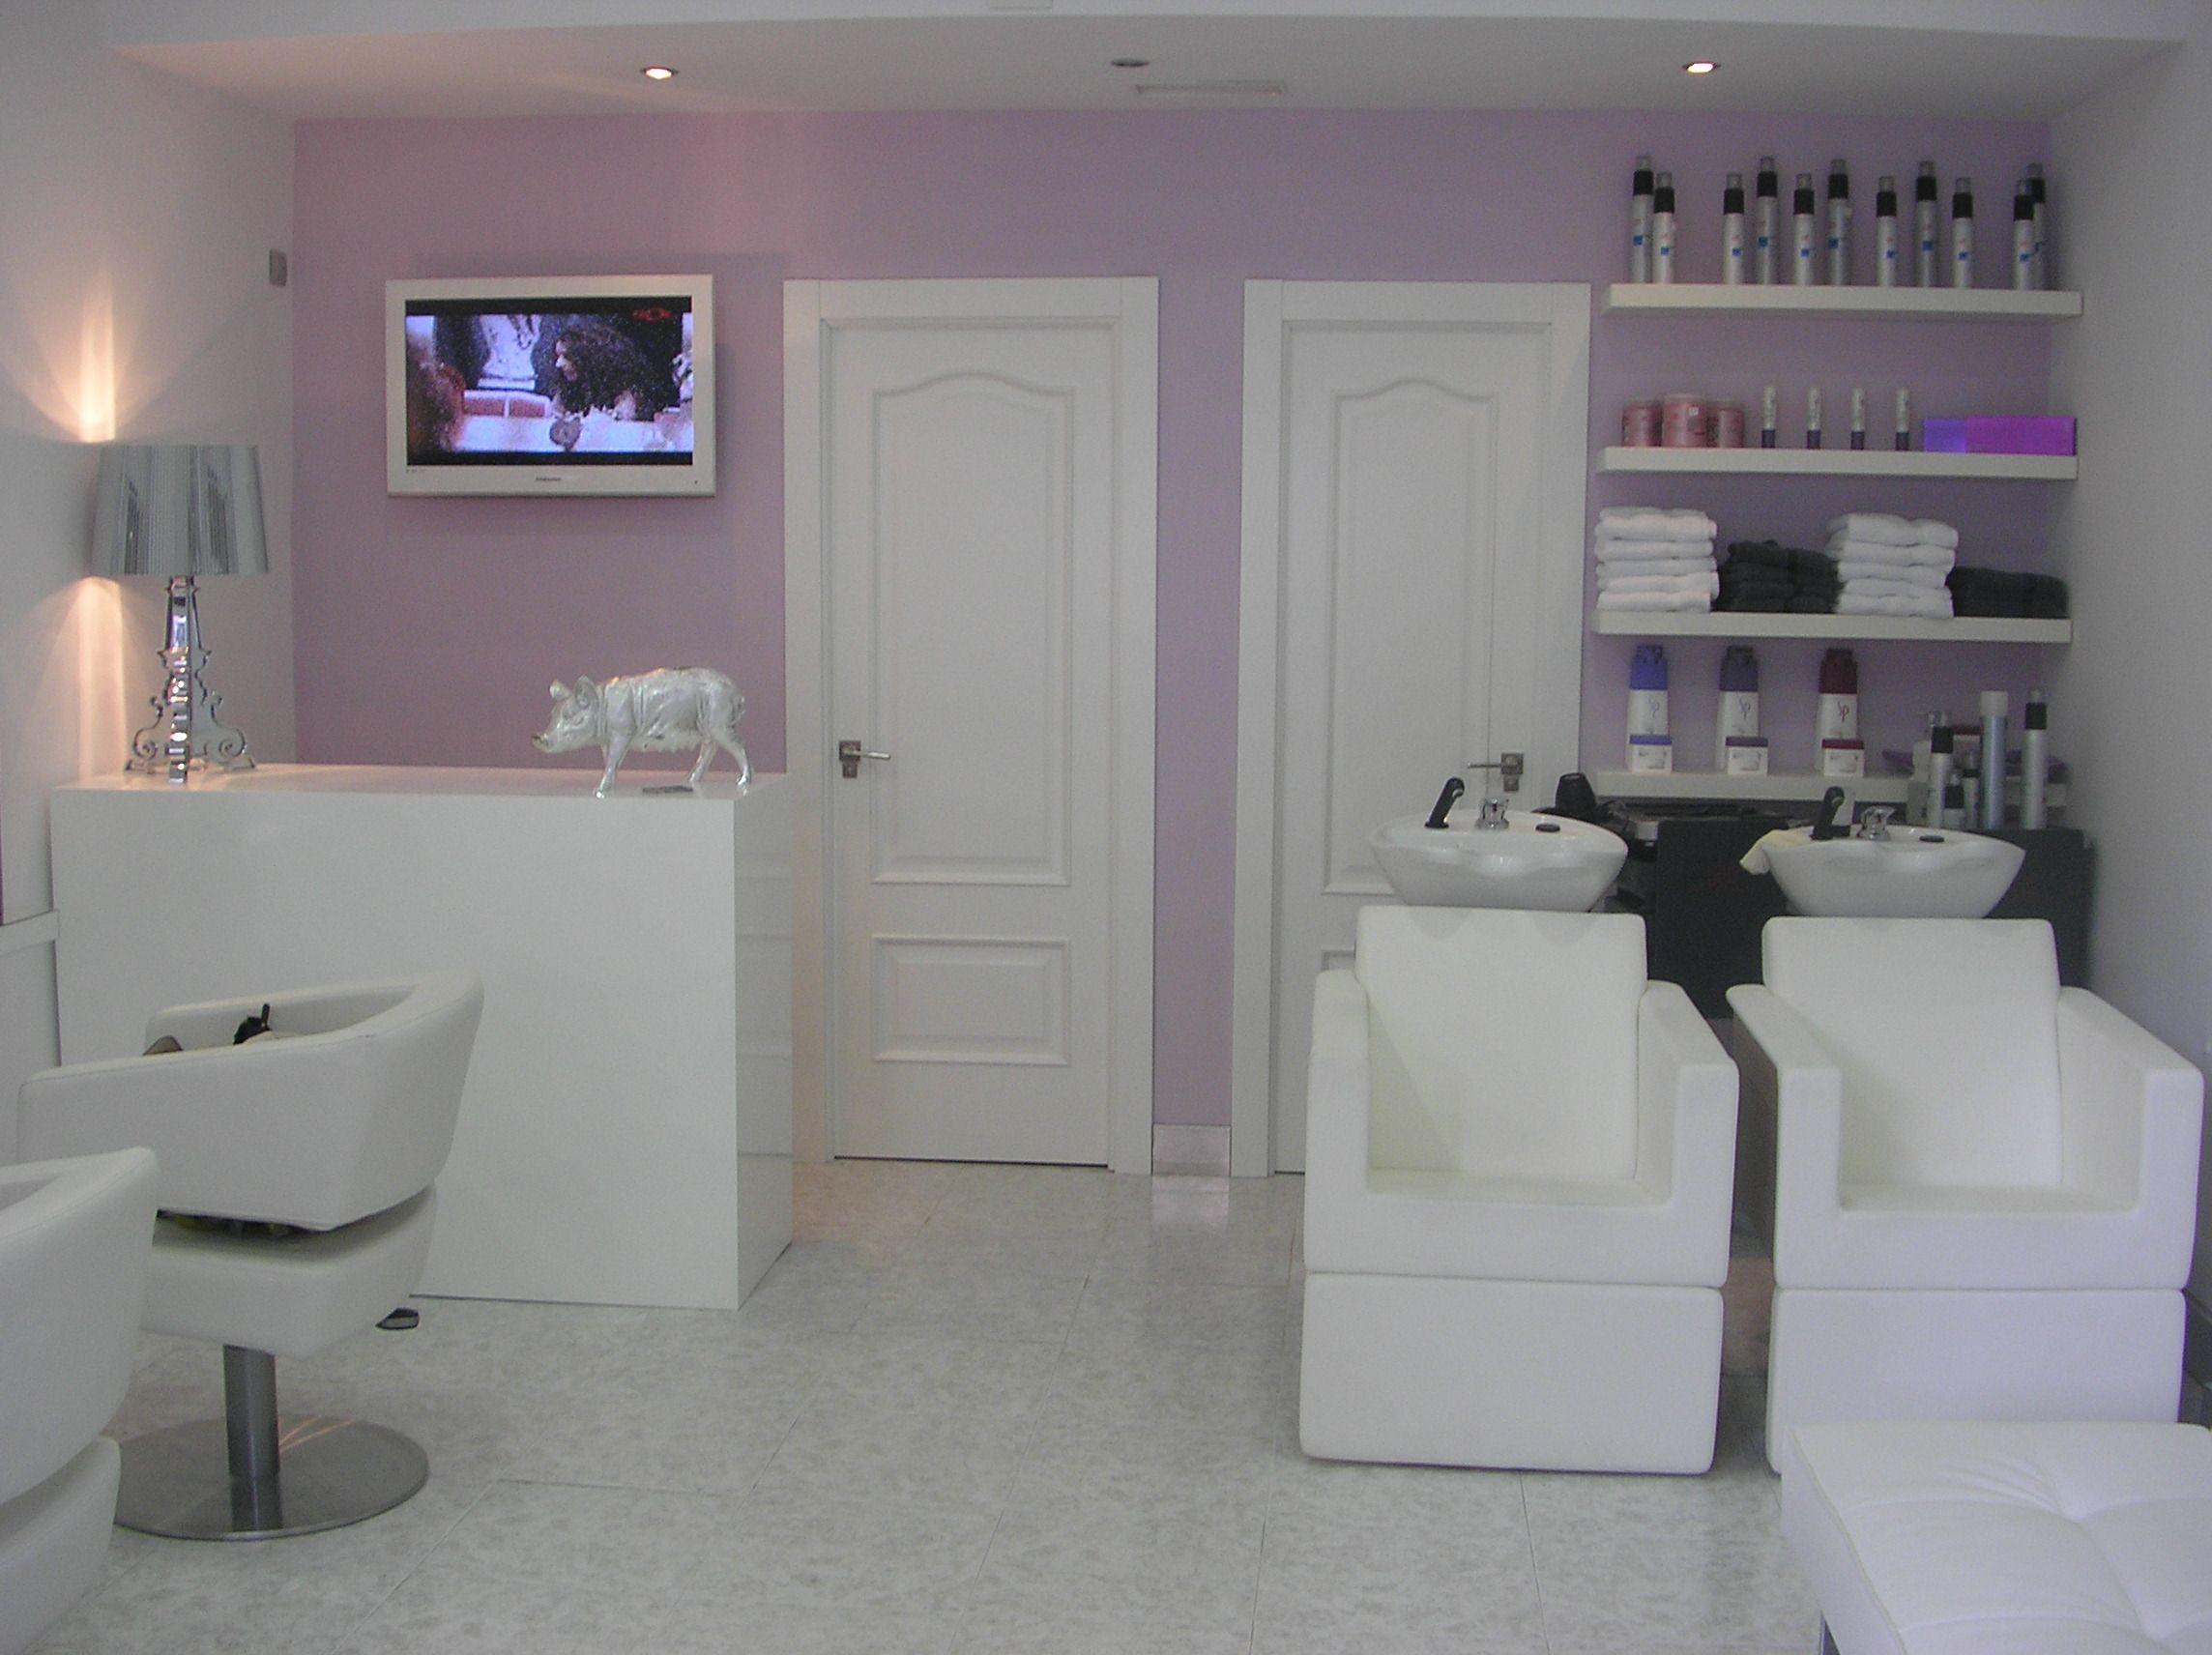 Proyecto peluqueria proyectos decoraci n interiorismomdr - Salones de peluqueria decoracion fotos ...